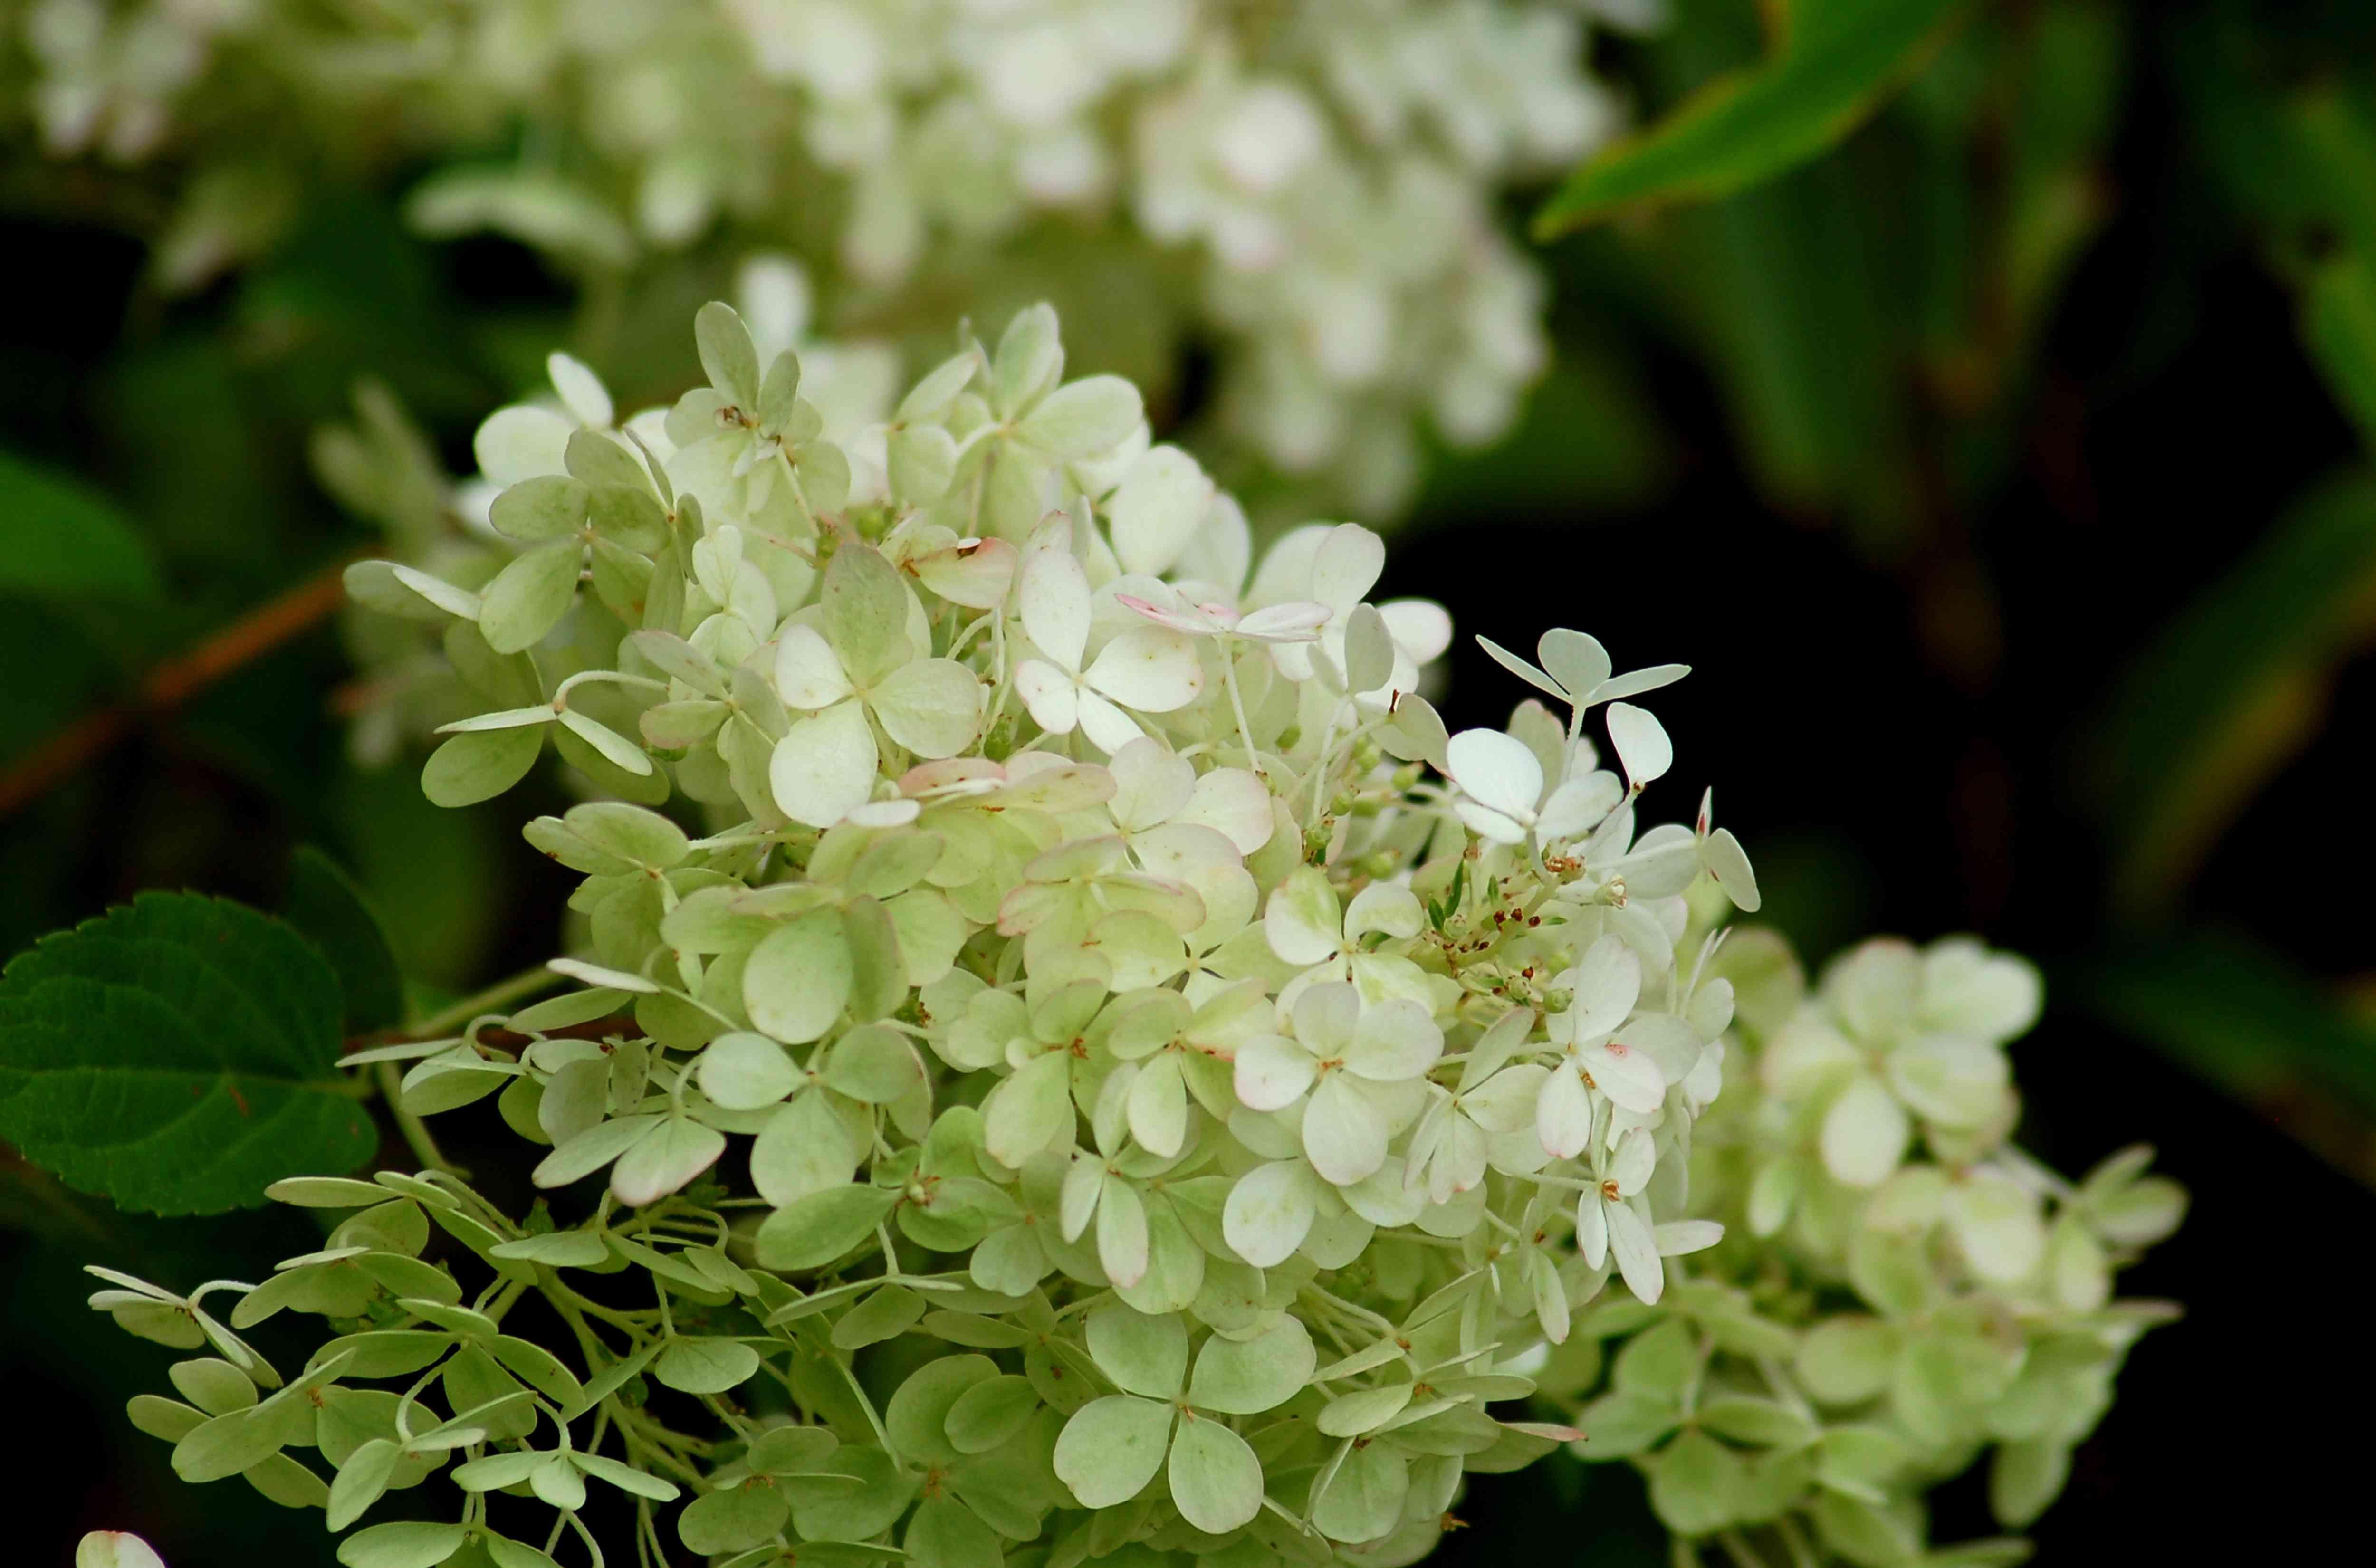 'Bobo' hydrangea with white flowers